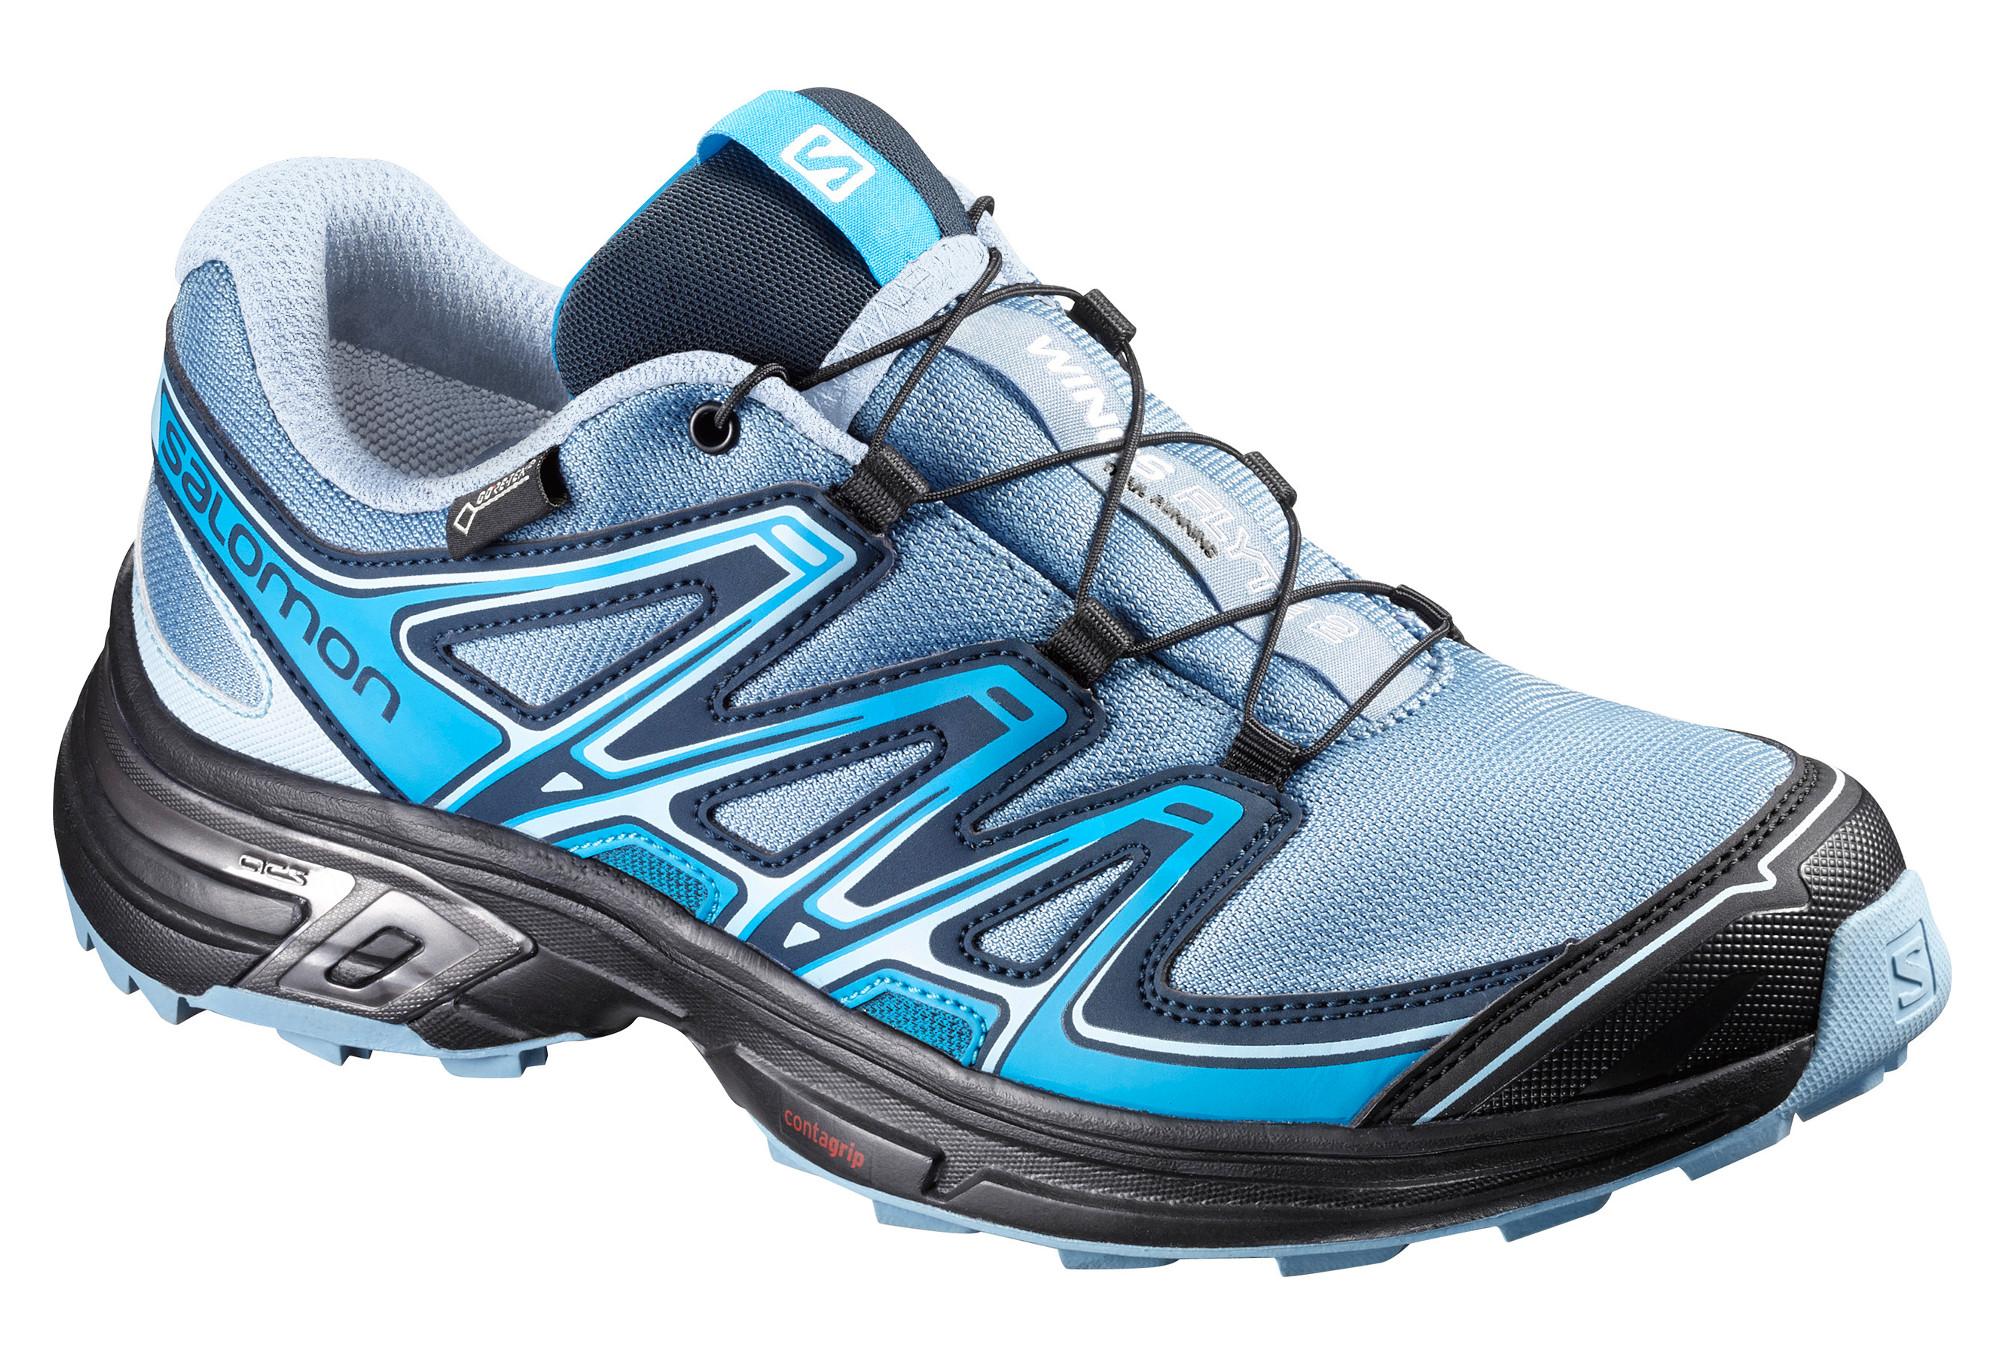 b1292f3f145 Chaussures de Trail Femme Salomon WINGS FLYTE 2 GTX Bleu